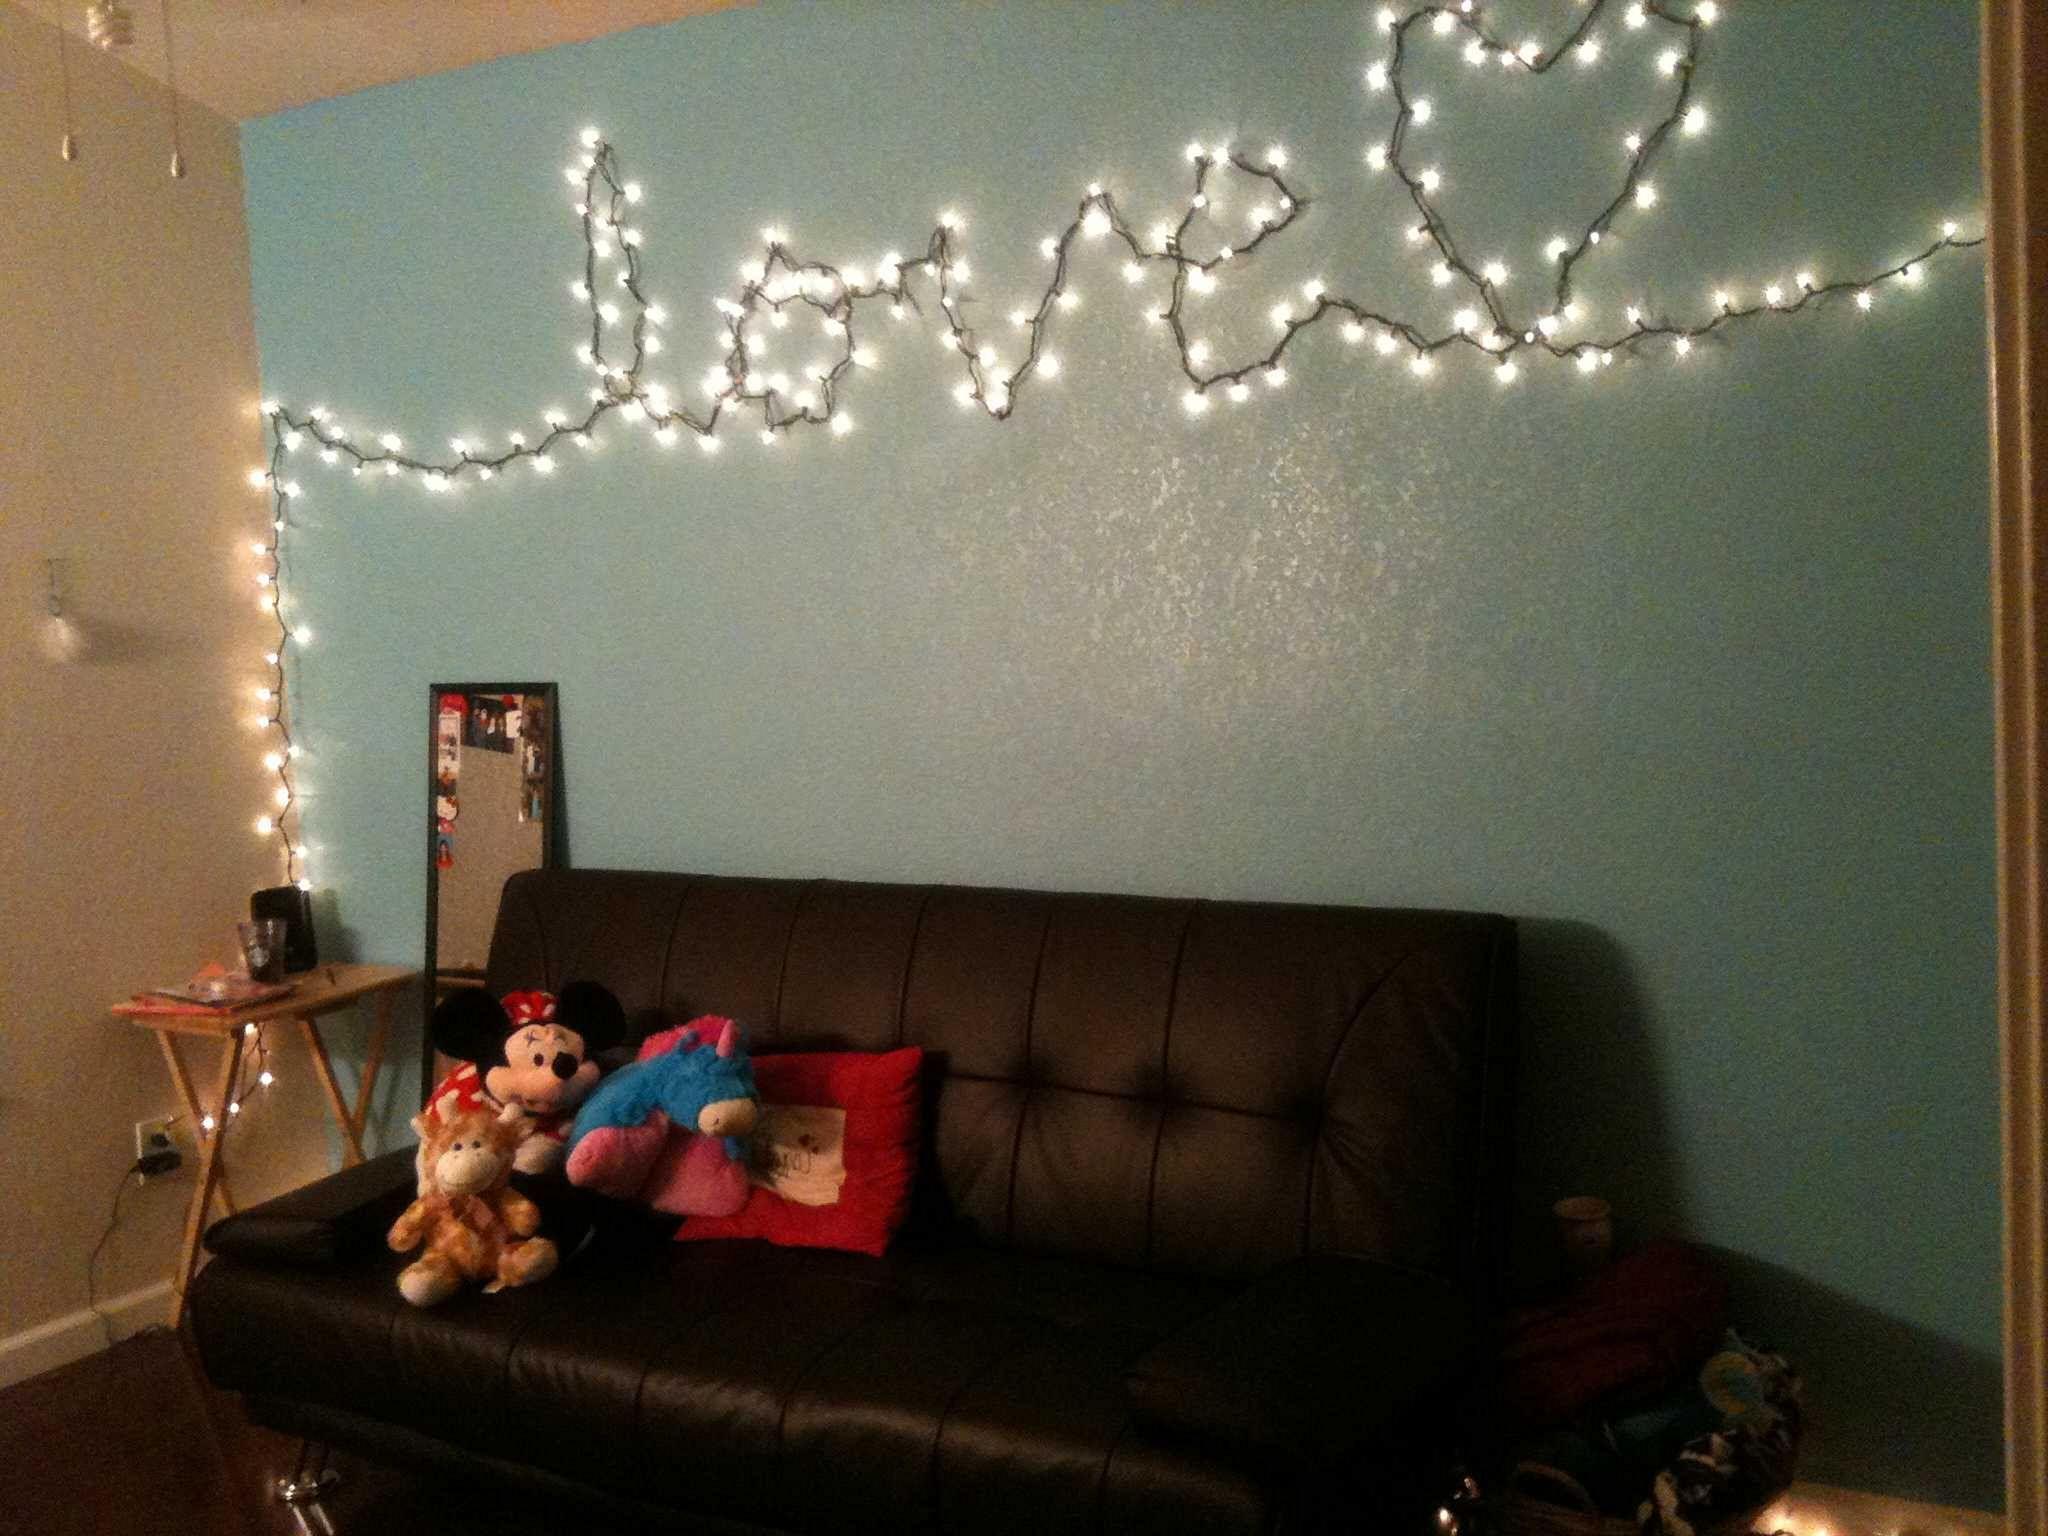 Nice 35 Amazing Christmas Light Bedroom Decoration Ideas Https Usdecorating Com 38 Christmas Lights In Bedroom Christmas Lights In Room Diy Christmas Lights